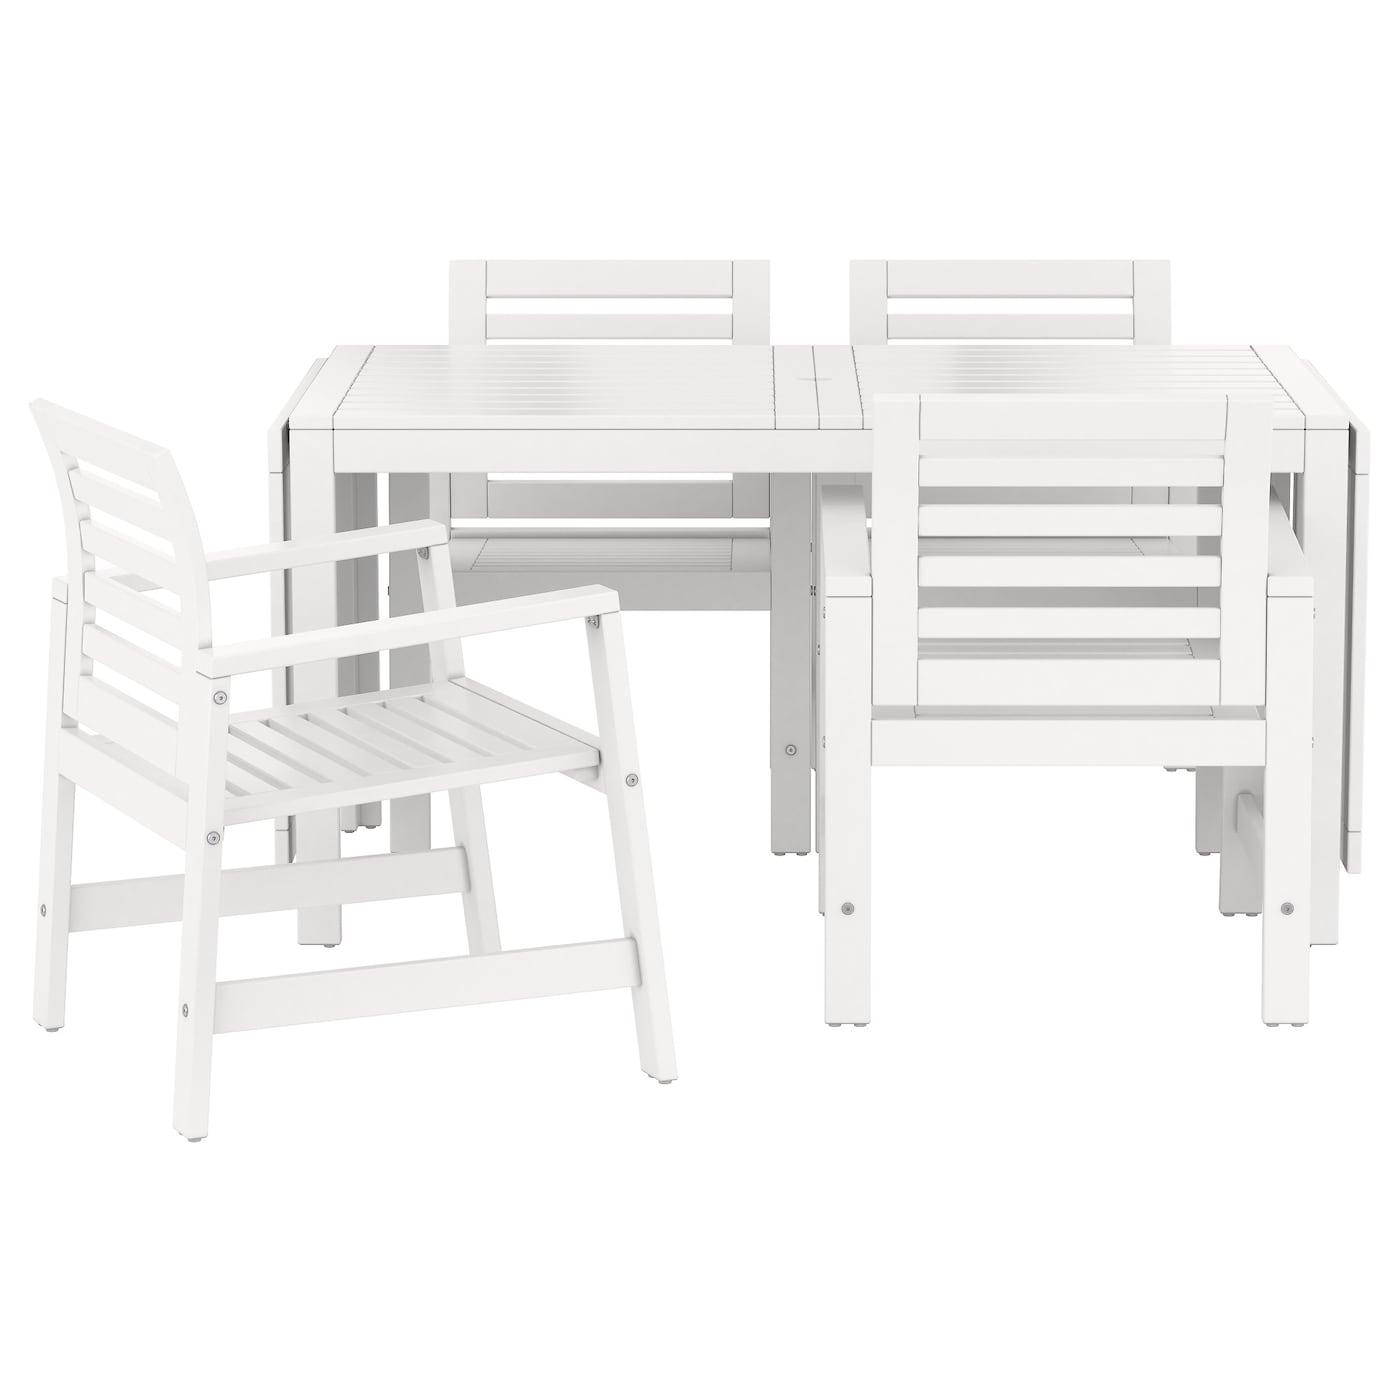 Ikea rimini informazioni e orari ikea for Ikea orari rimini